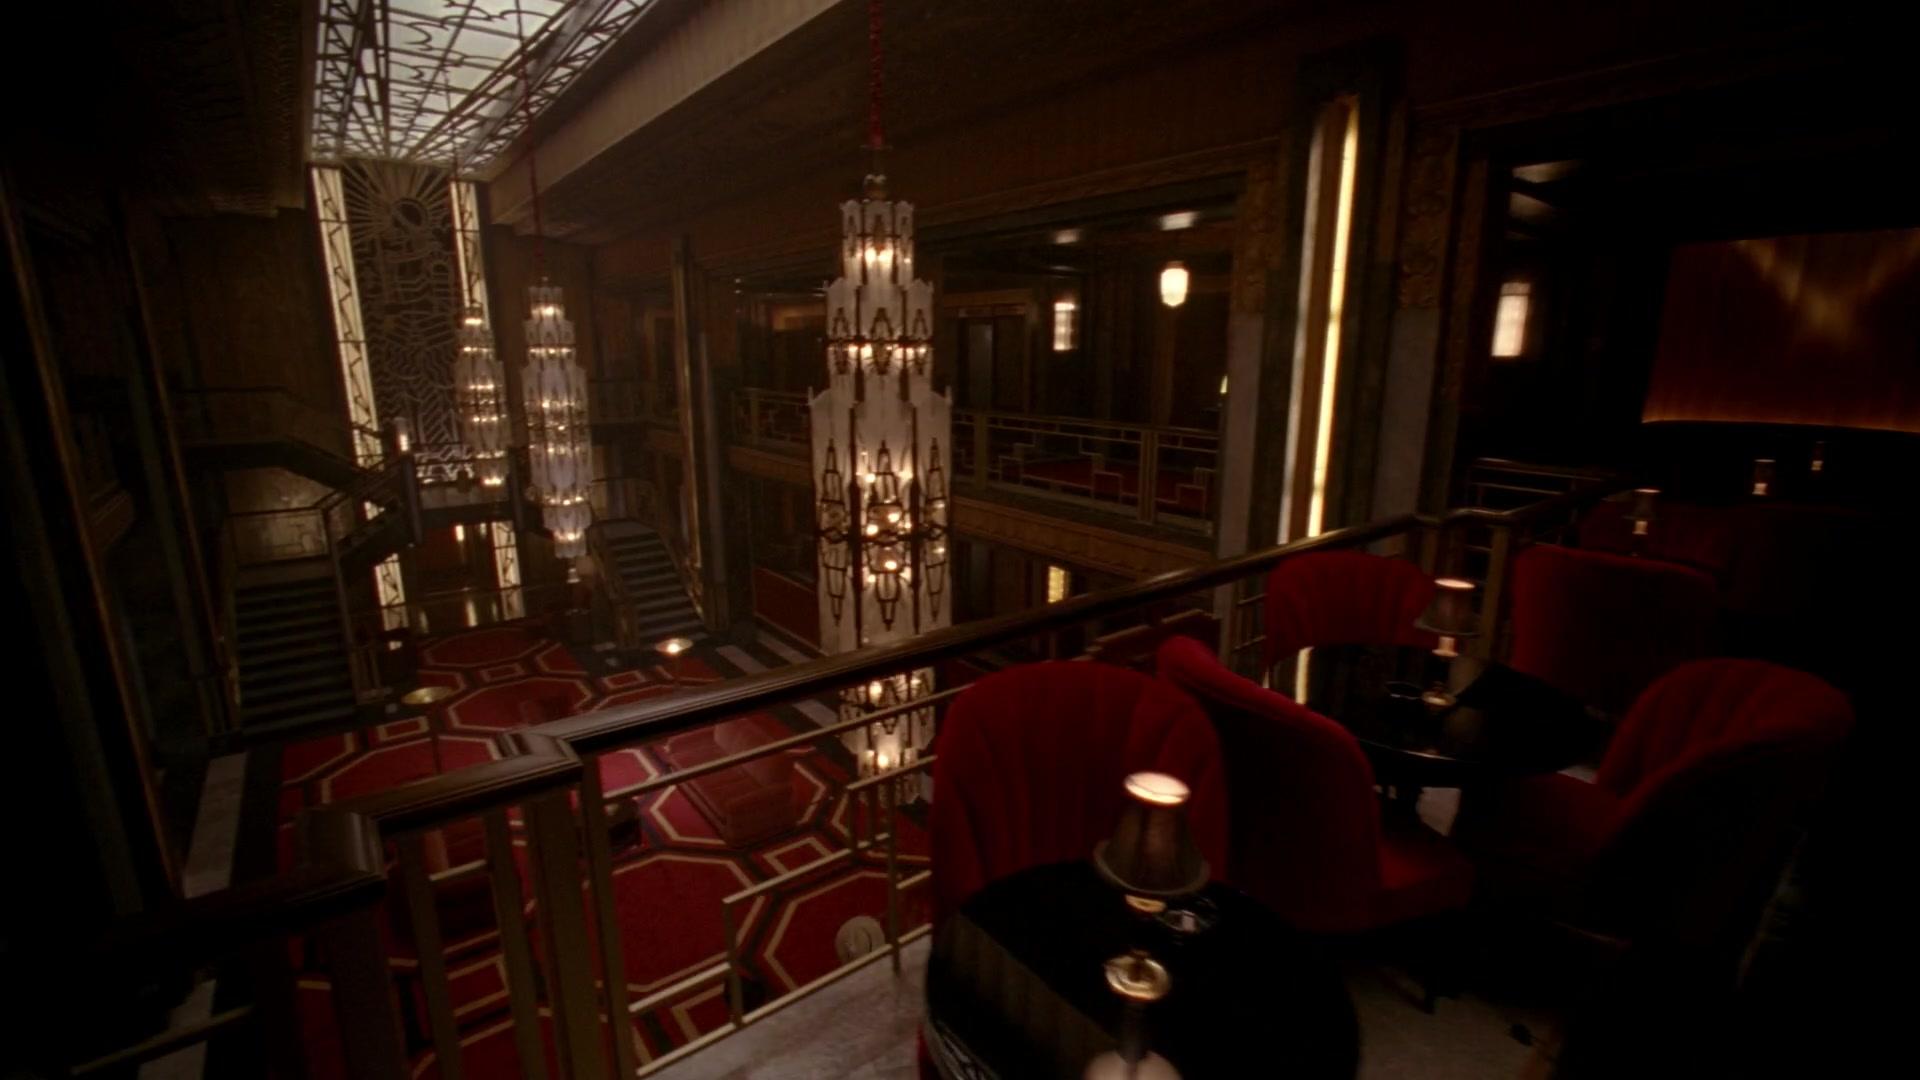 Image Hotel Cortez Lobby 002 Jpeg American Horror